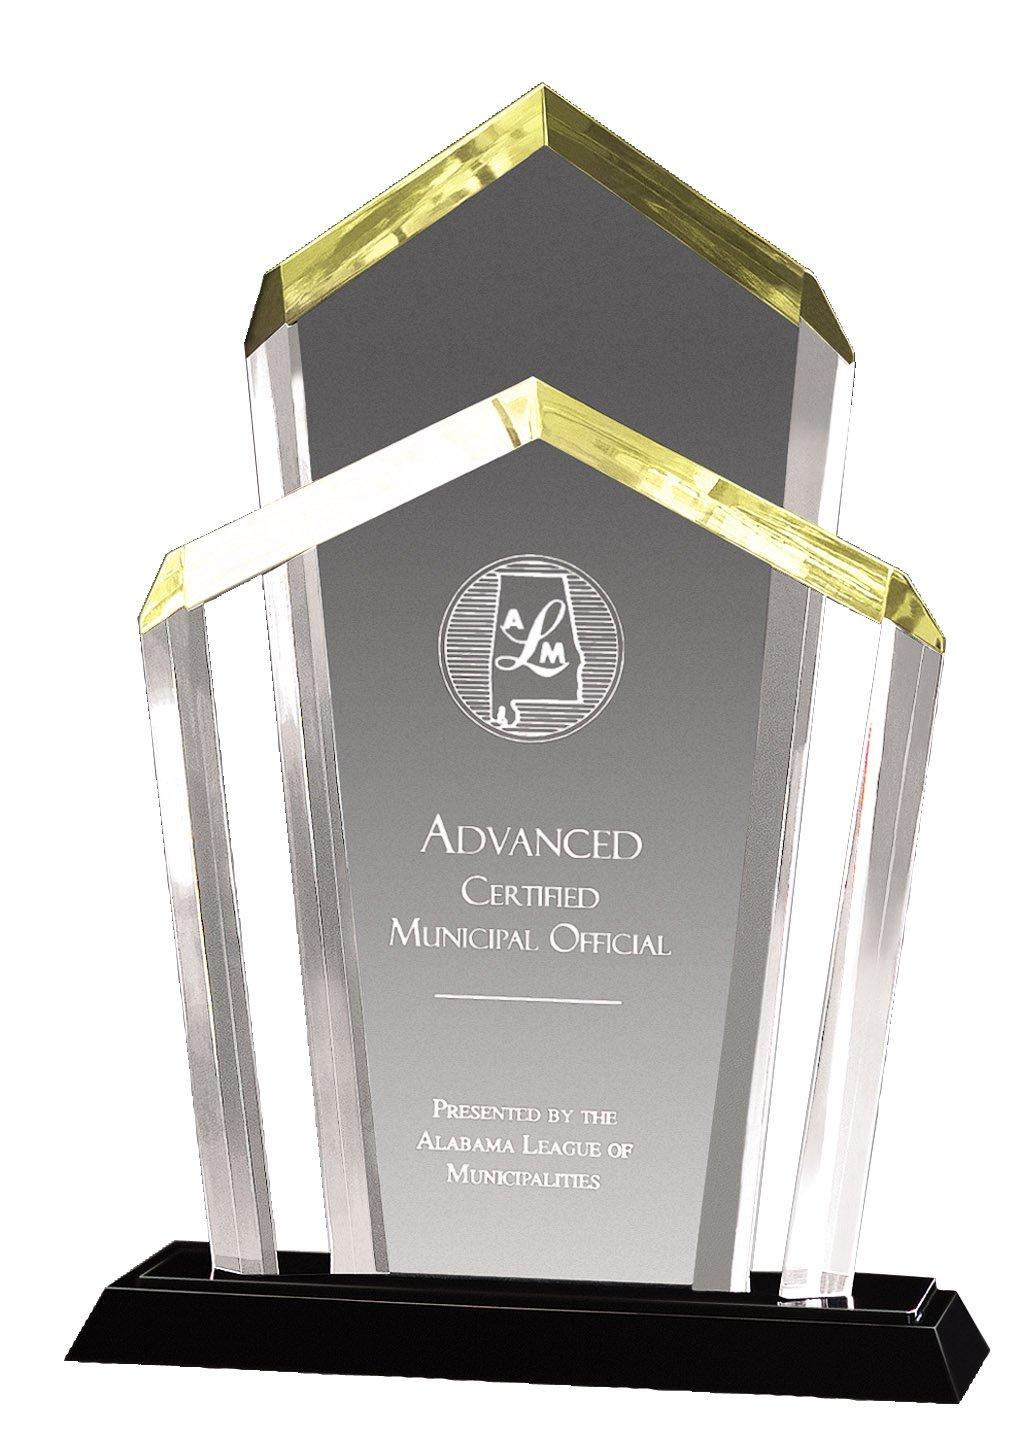 The Trophy Studio Chairman Acrylic Award 8 1/2'' x 12 1/4'' tall